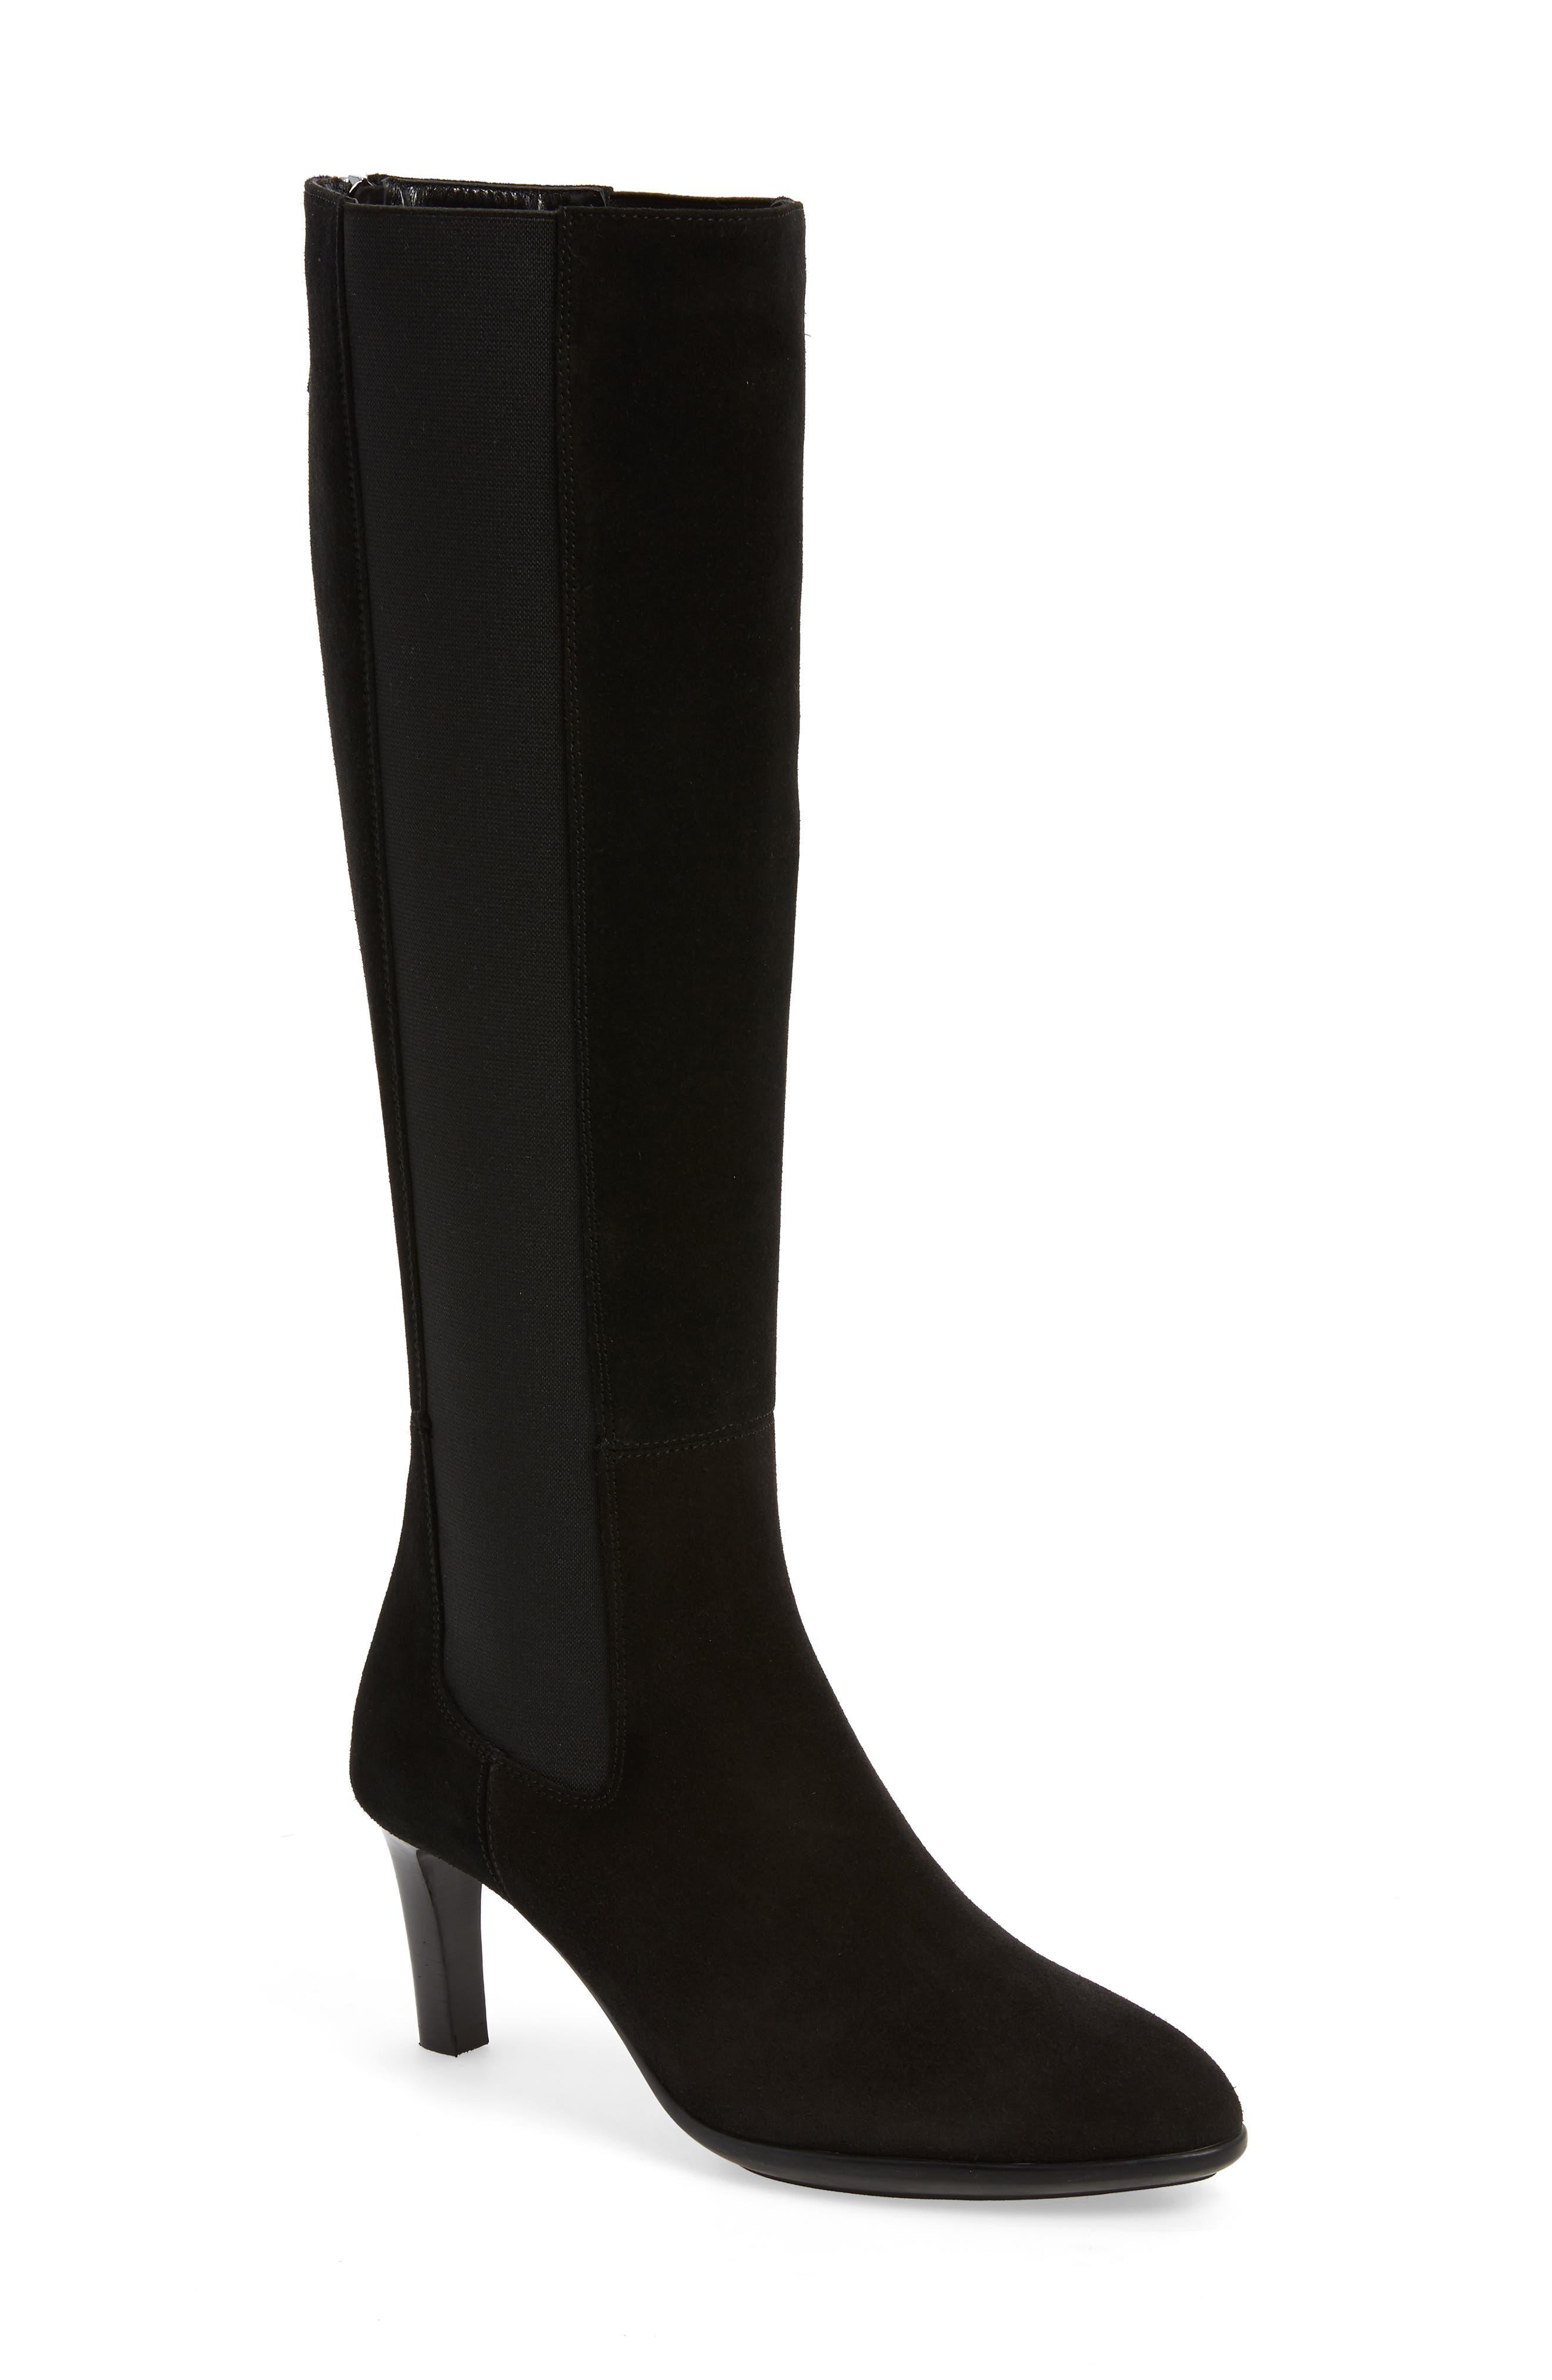 AQUATALIA Dahliana Weatherproof Knee High Boot, Main, color, BLACK